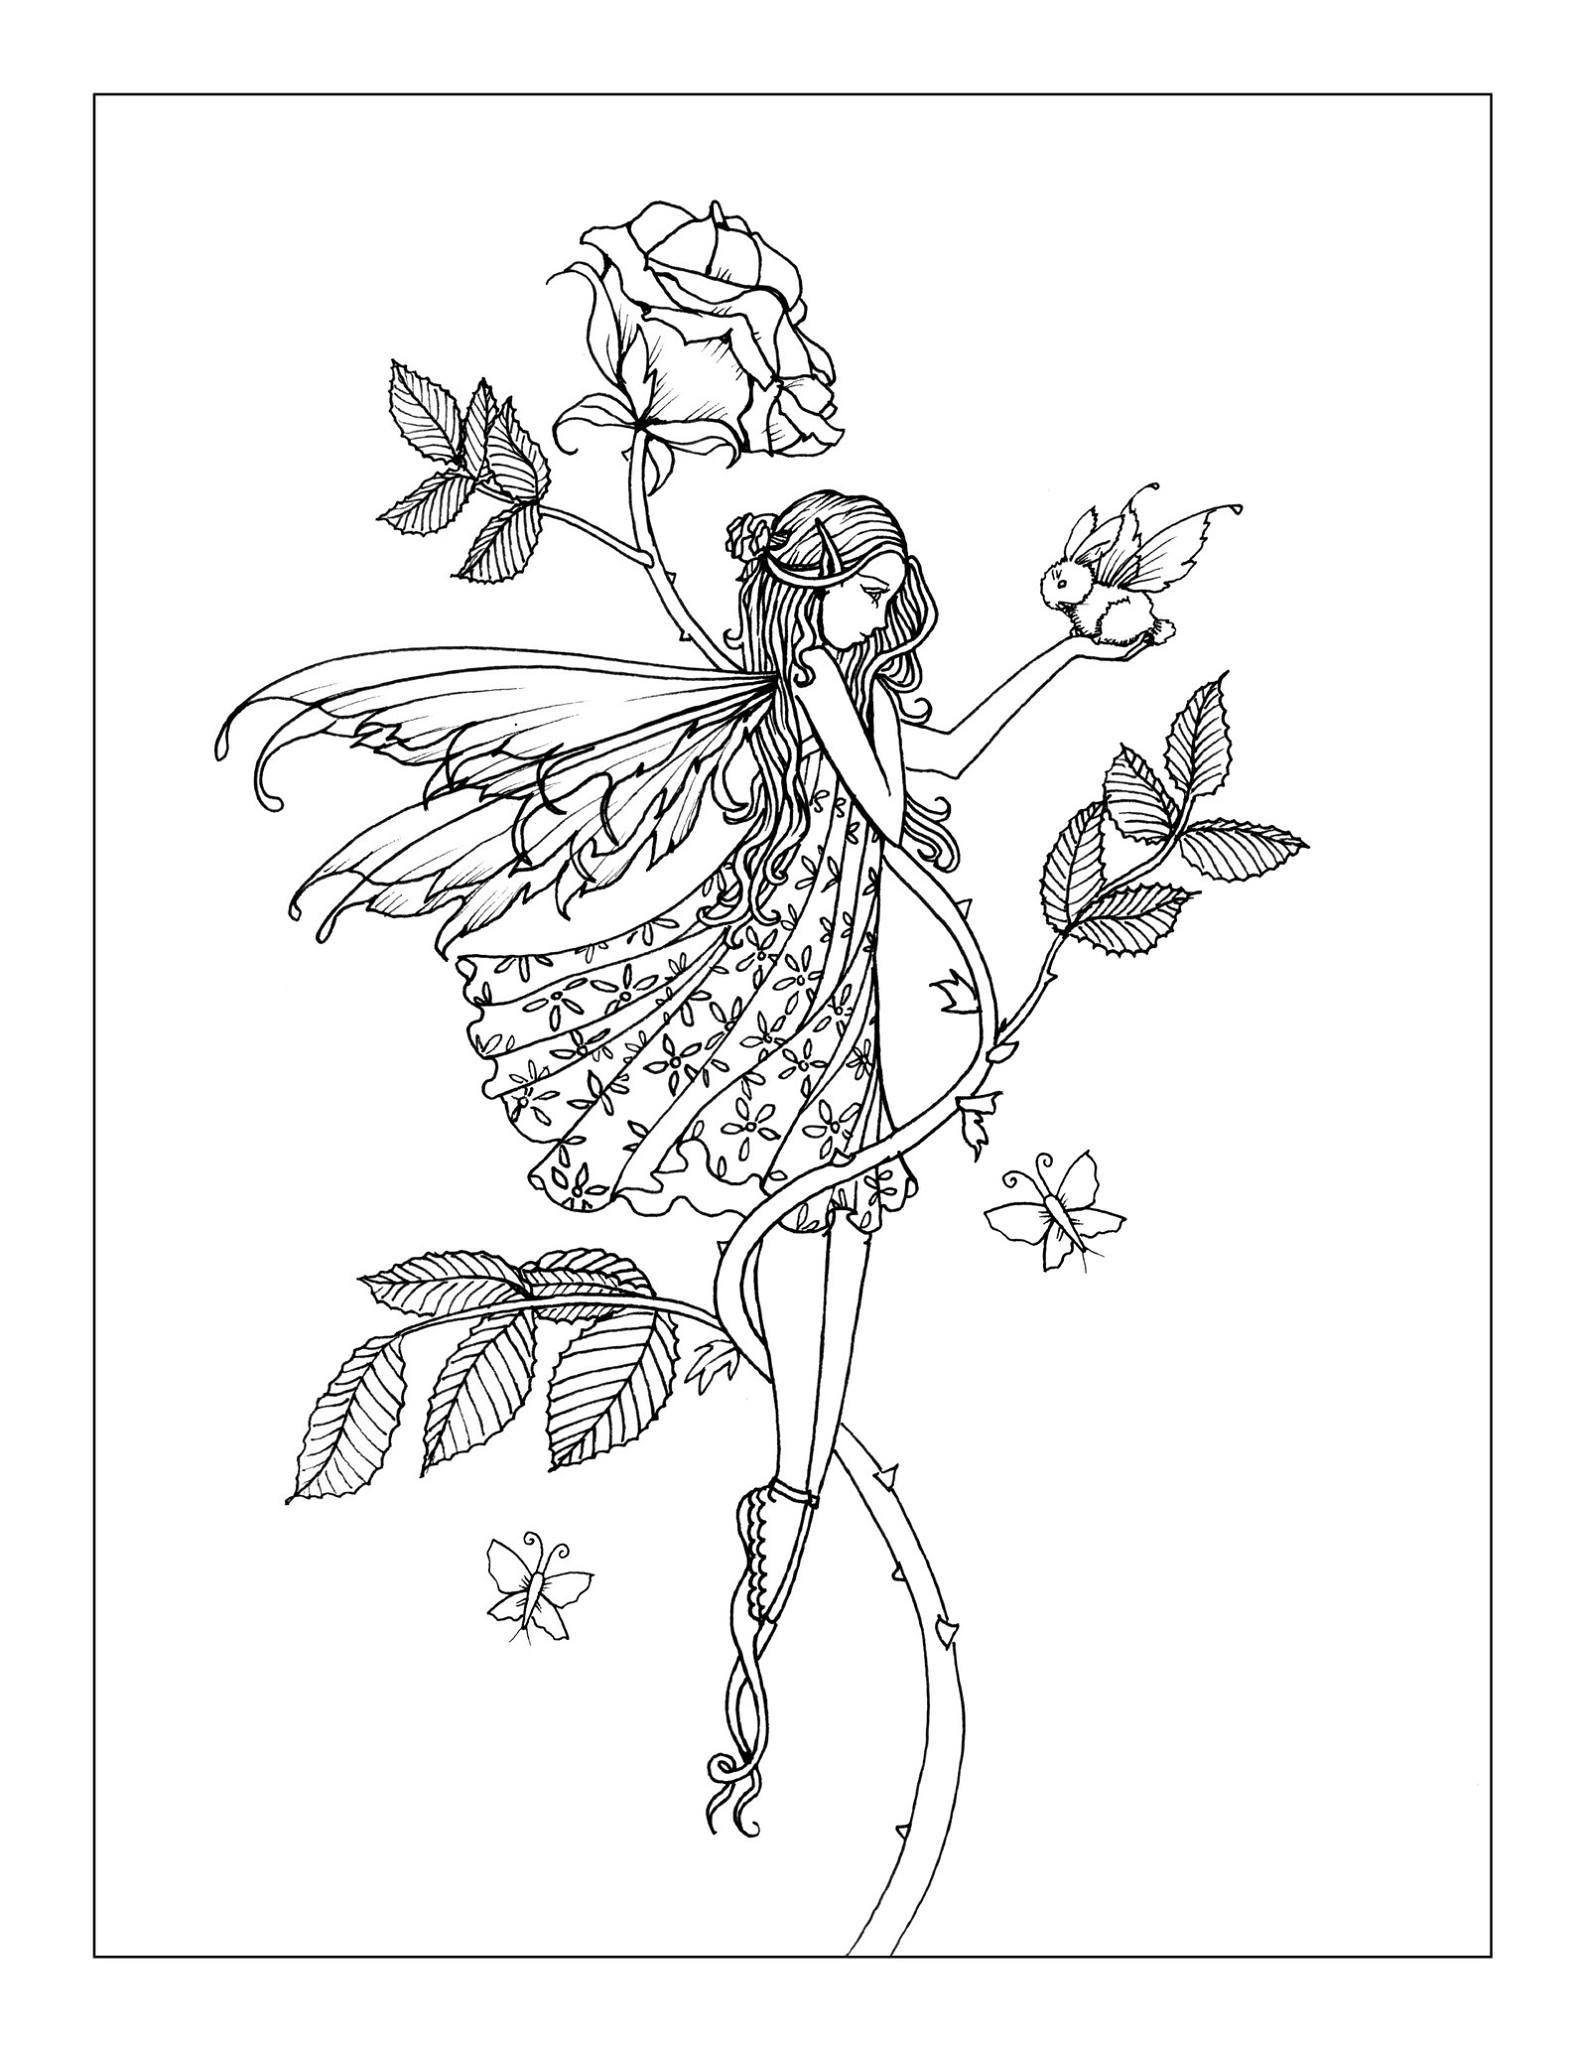 Pin de Lori Buckman-Wile en coloring | Pinterest | Colorear dibujos ...